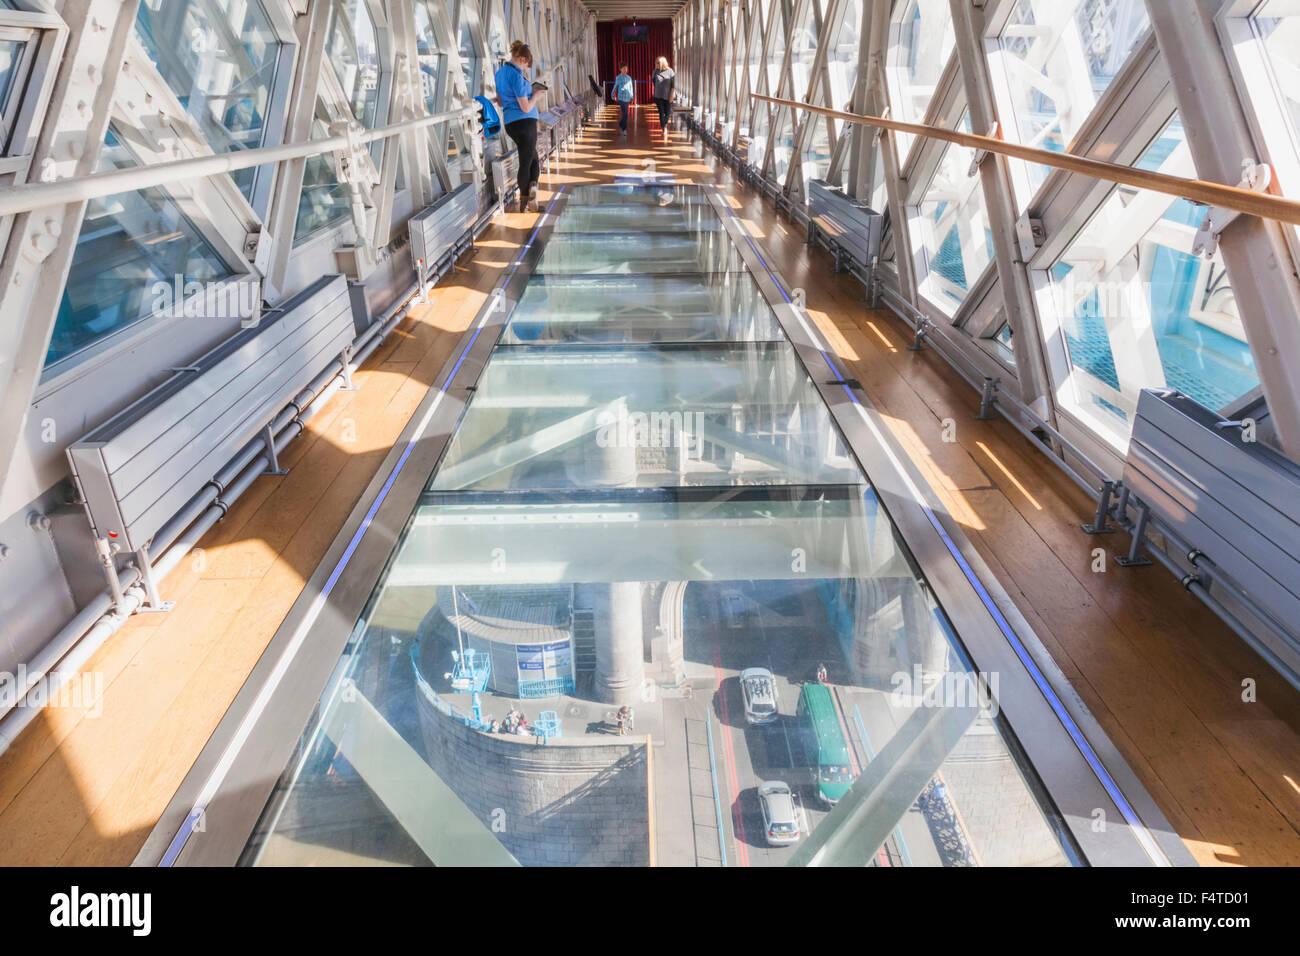 England, London, Tower Bridge, Interior Glass Walkway - Stock Image